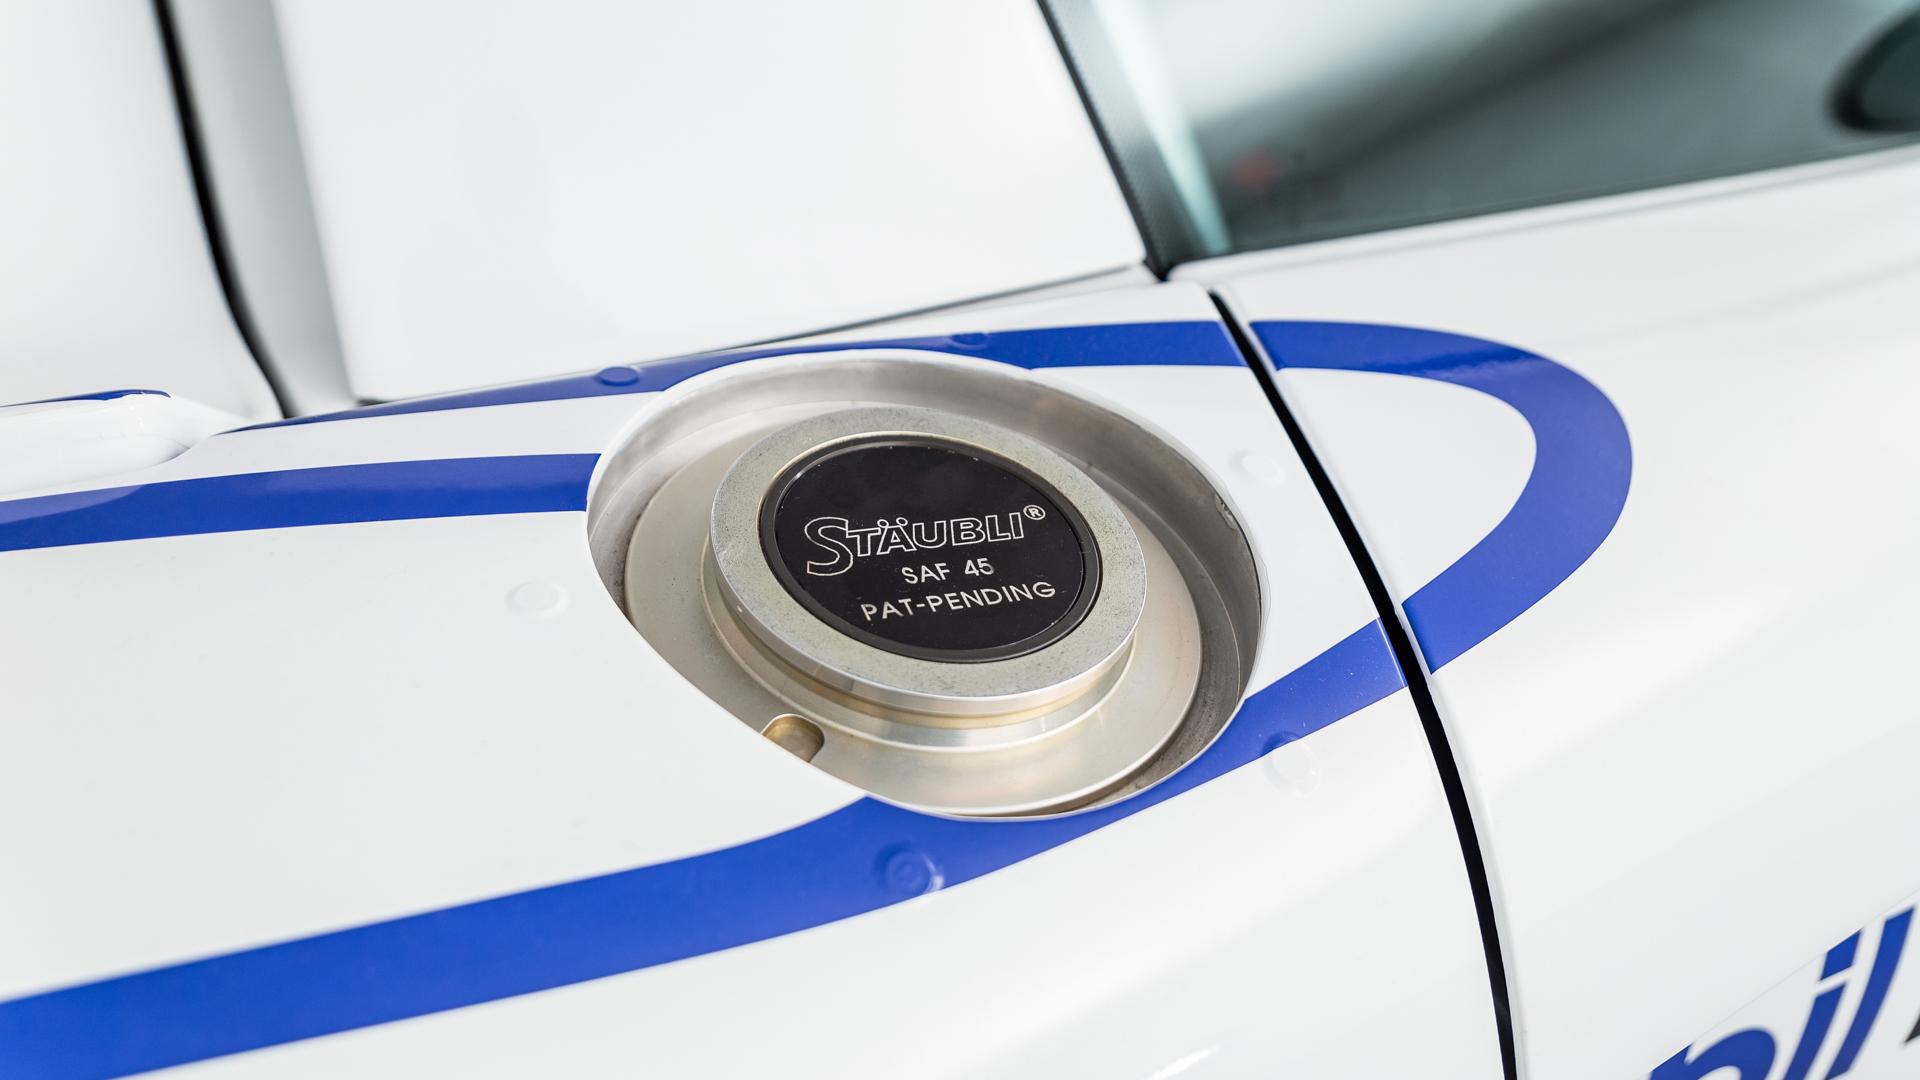 Carrera GT Racecar gas cap detail